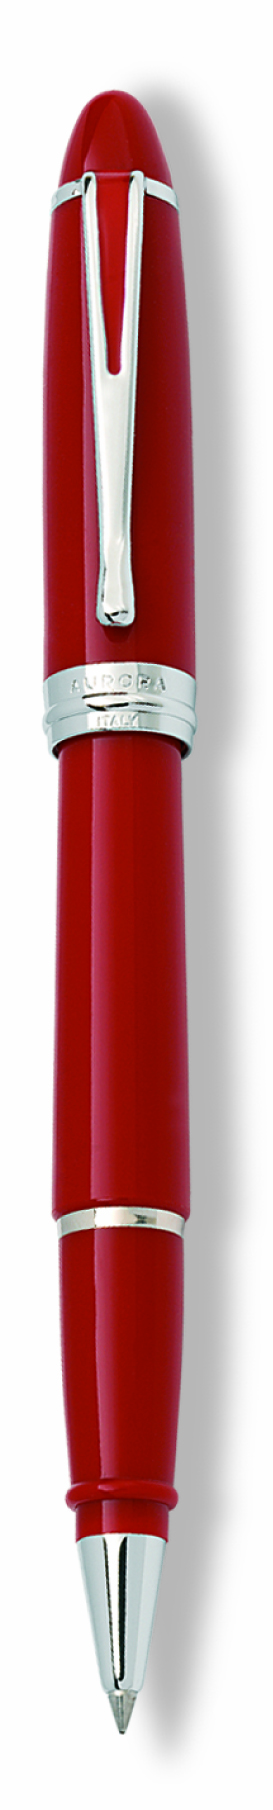 Aurora Ipsilon De Luxe Roller Rossa